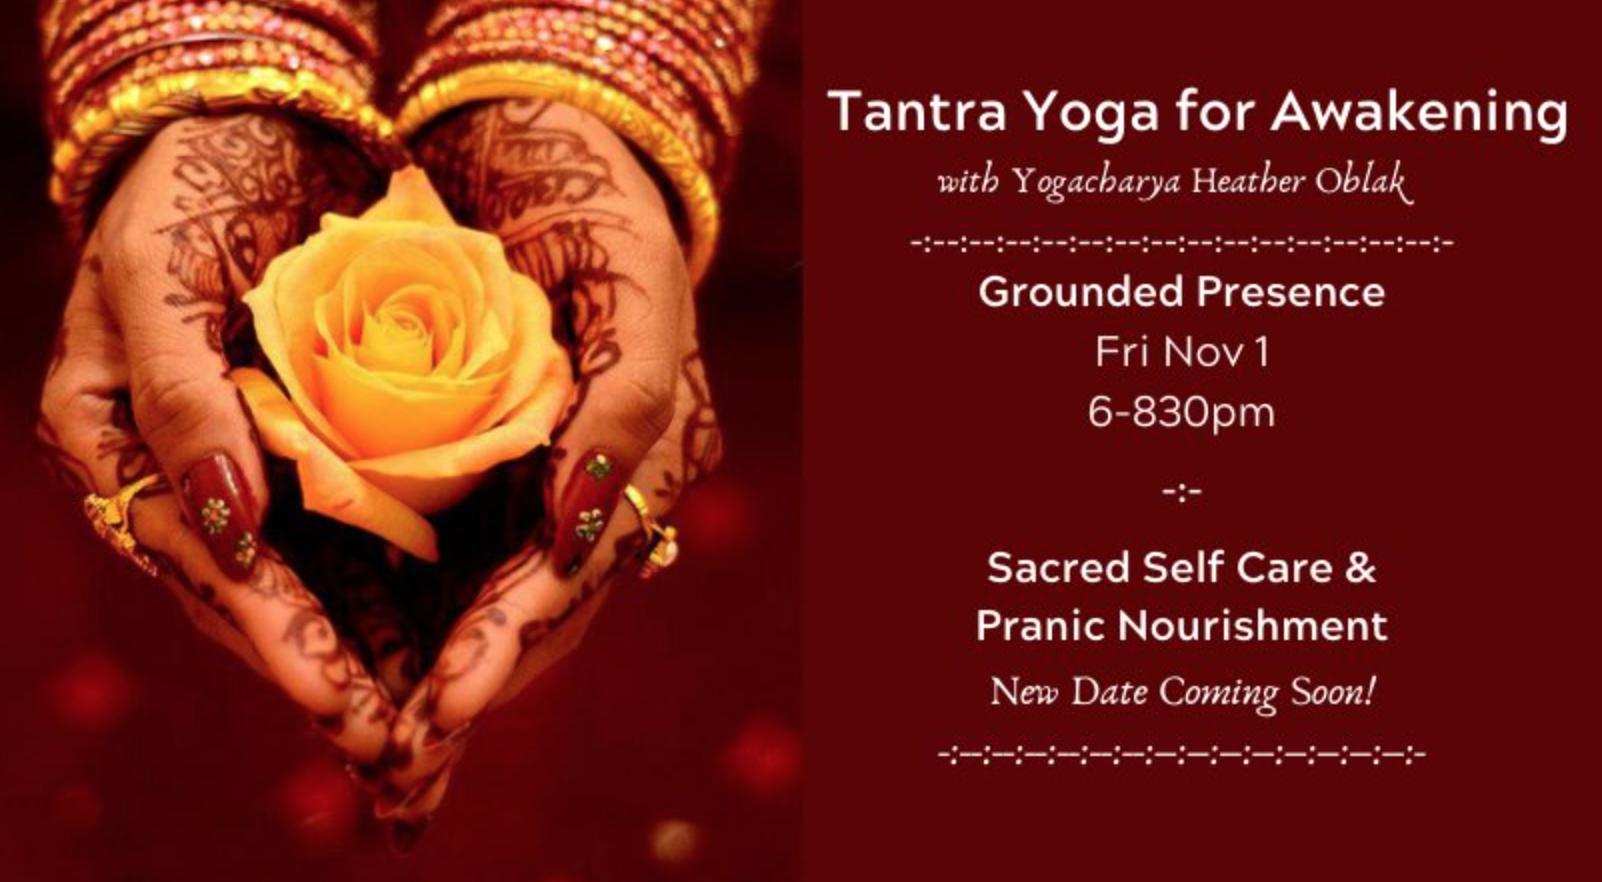 Tantra Yoga For Awakening Grounded Presence Mookshi Healing Arts Center